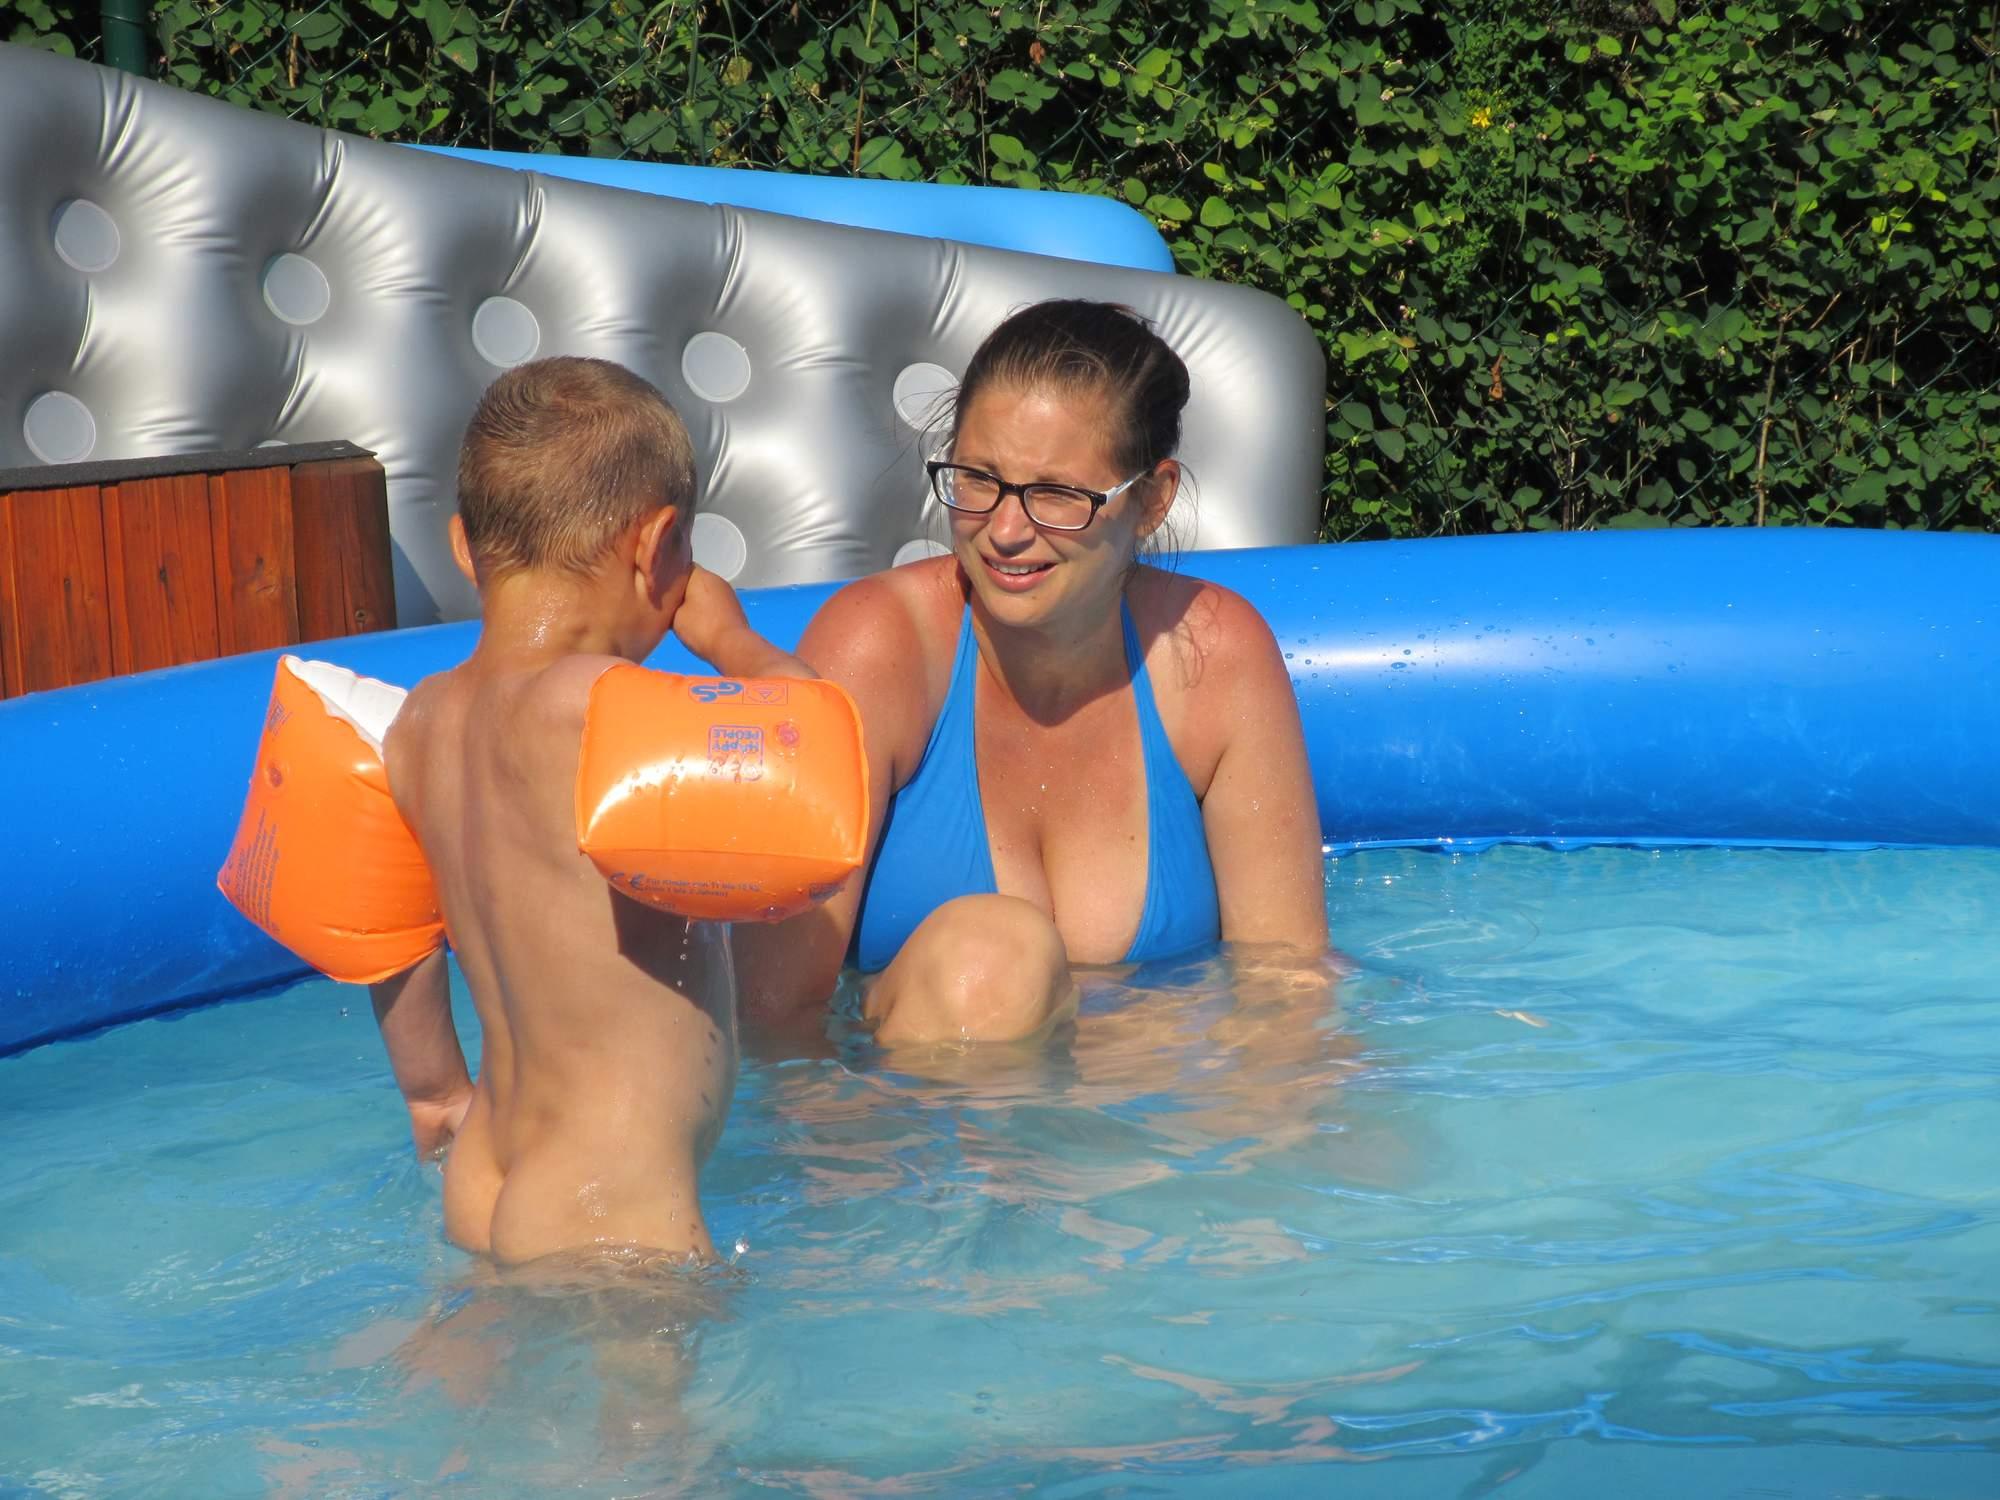 Pools with girls on boys, black thin teens